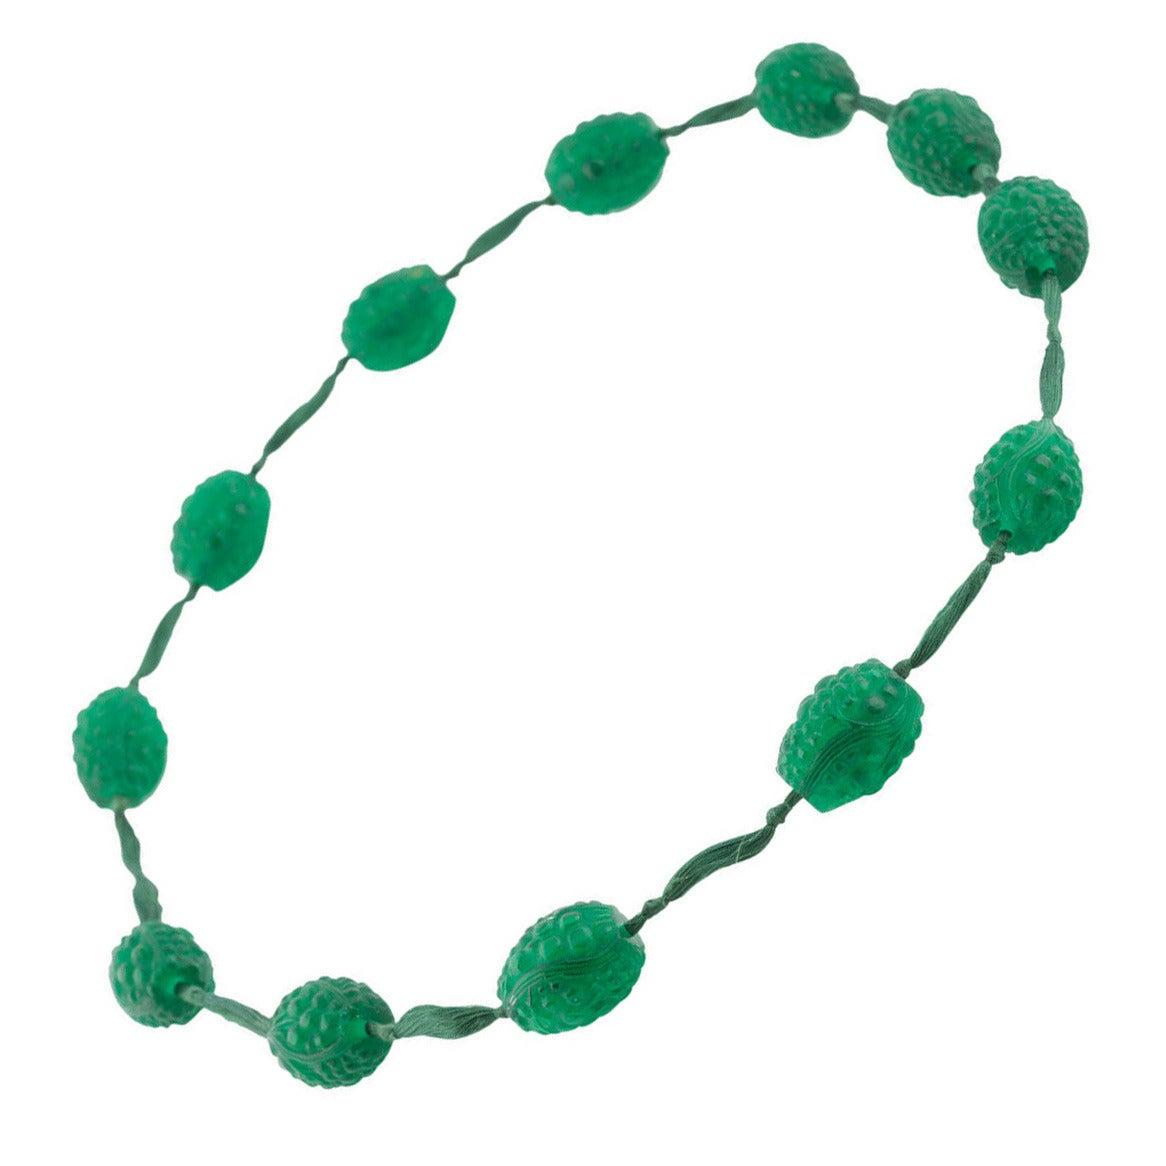 1920s René Emerald Green Lalique Grosses Graines Bead Necklace 1